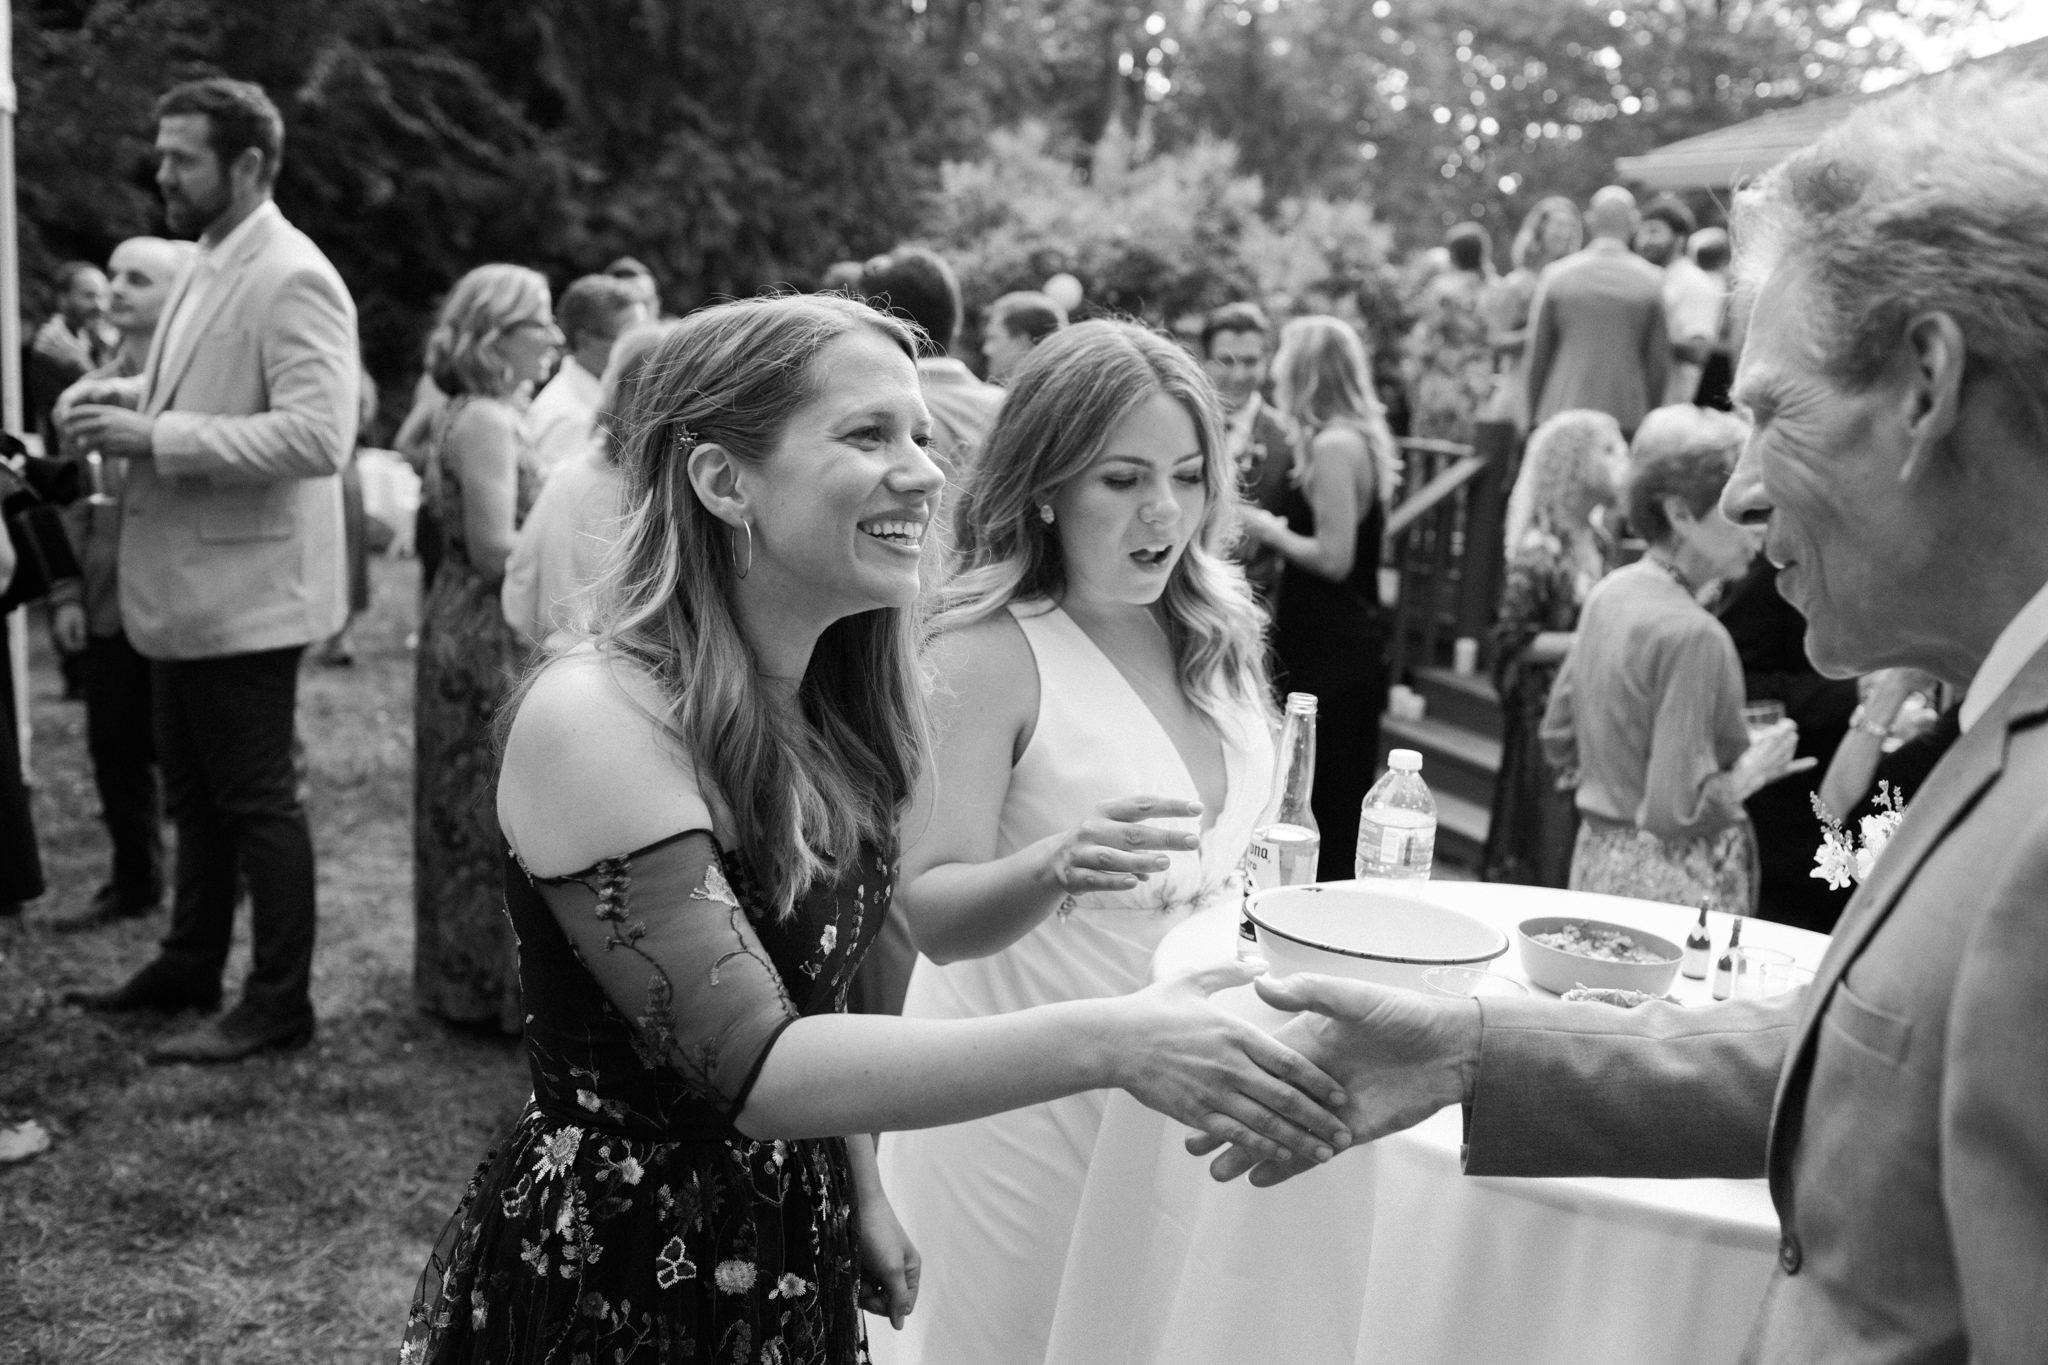 Backyard-Bainbridge-Island-Wedding-Alycia-Lovell-Photography-166.JPG